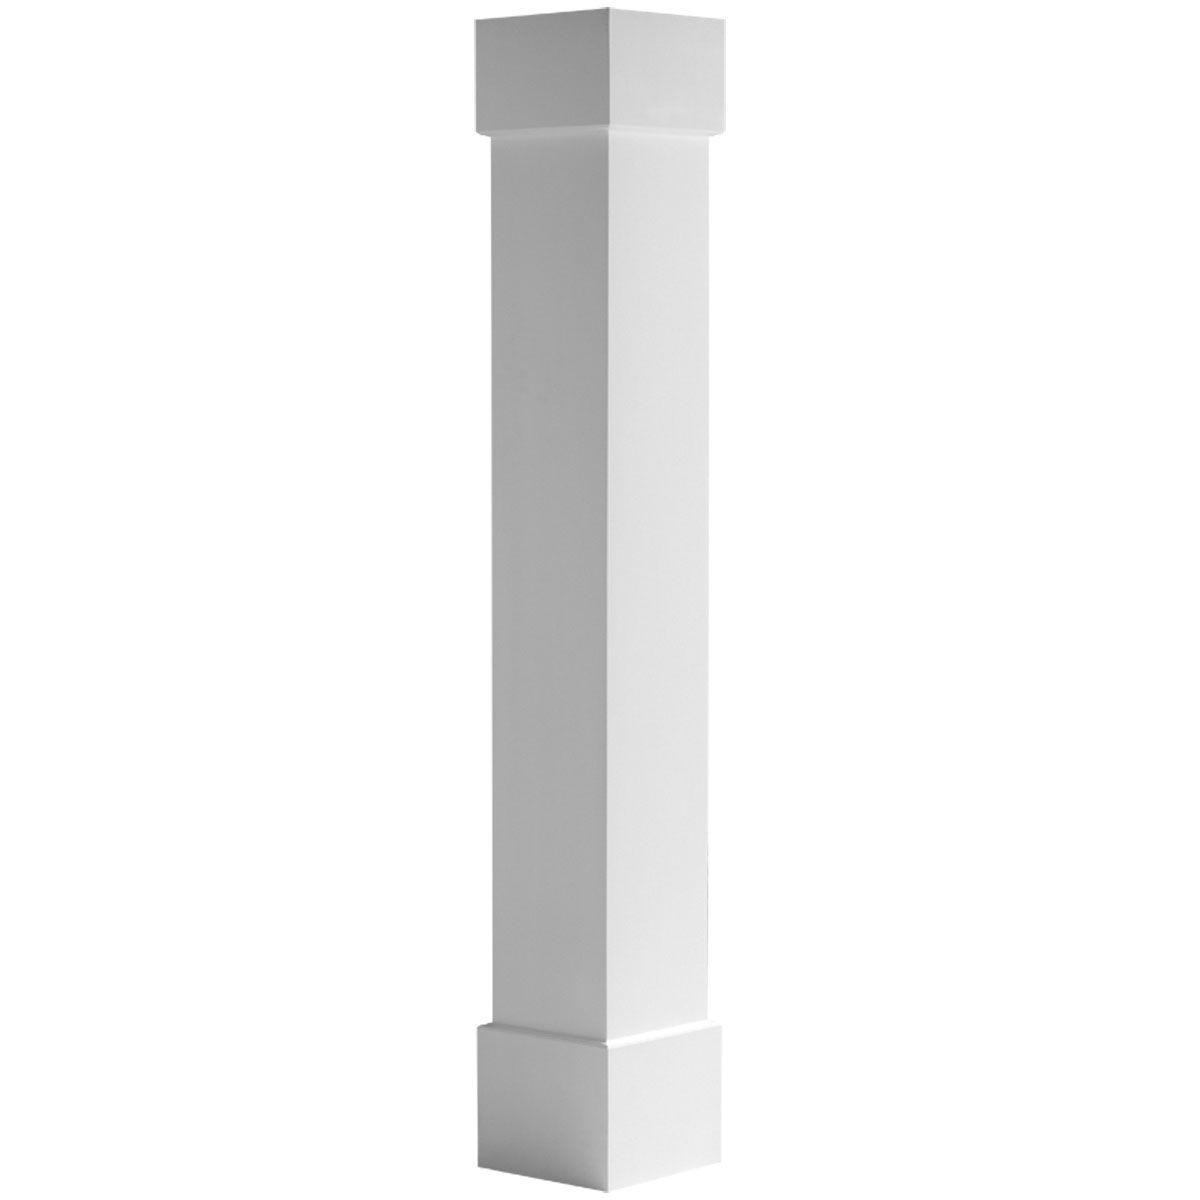 Endura-Craft Square Non-Tapered, Smooth Column